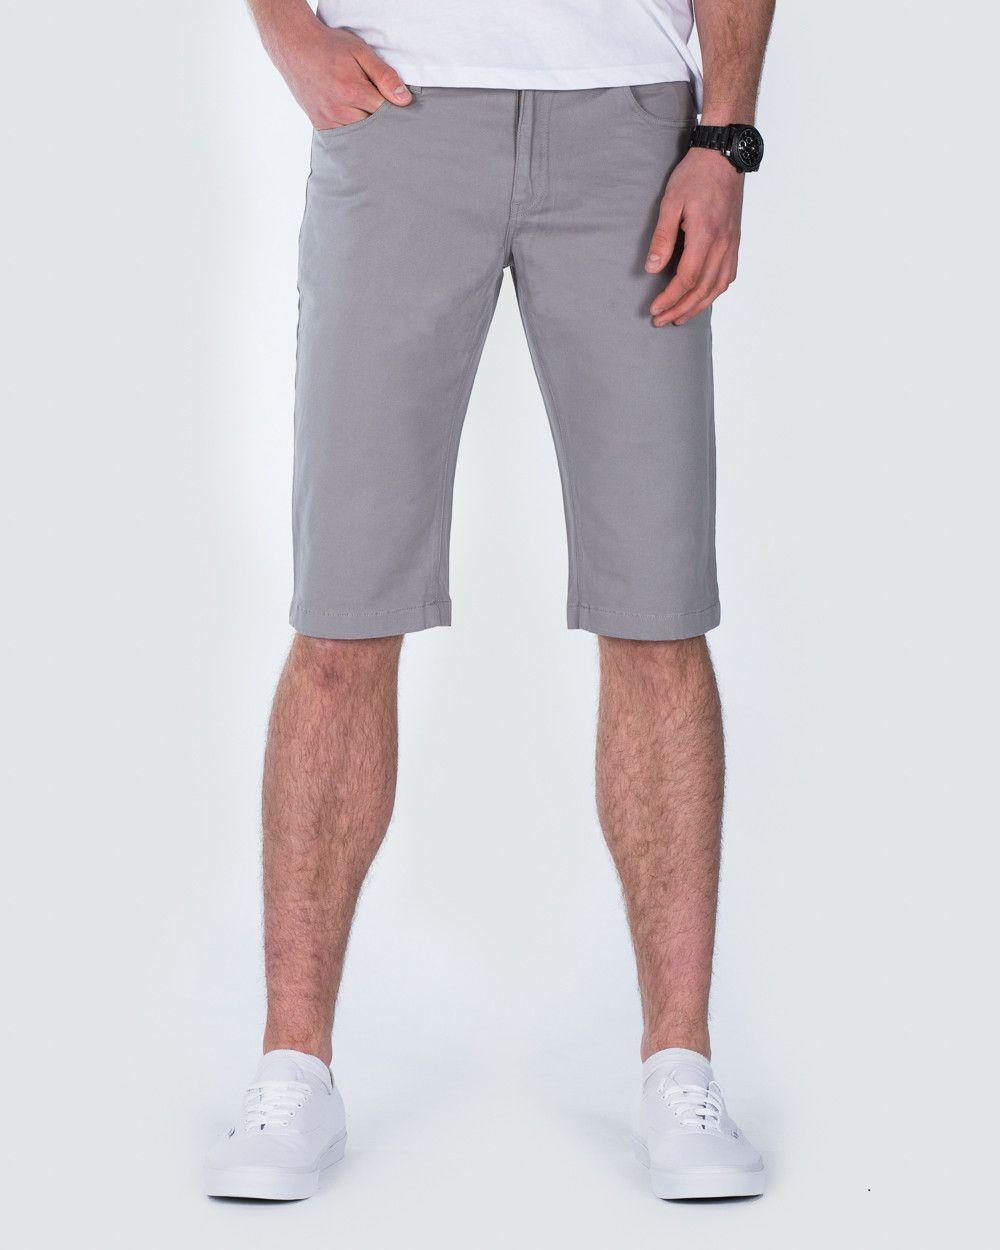 Ed baxter jay slim fit chino shorts grey tall chino for Extra tall dress shirts